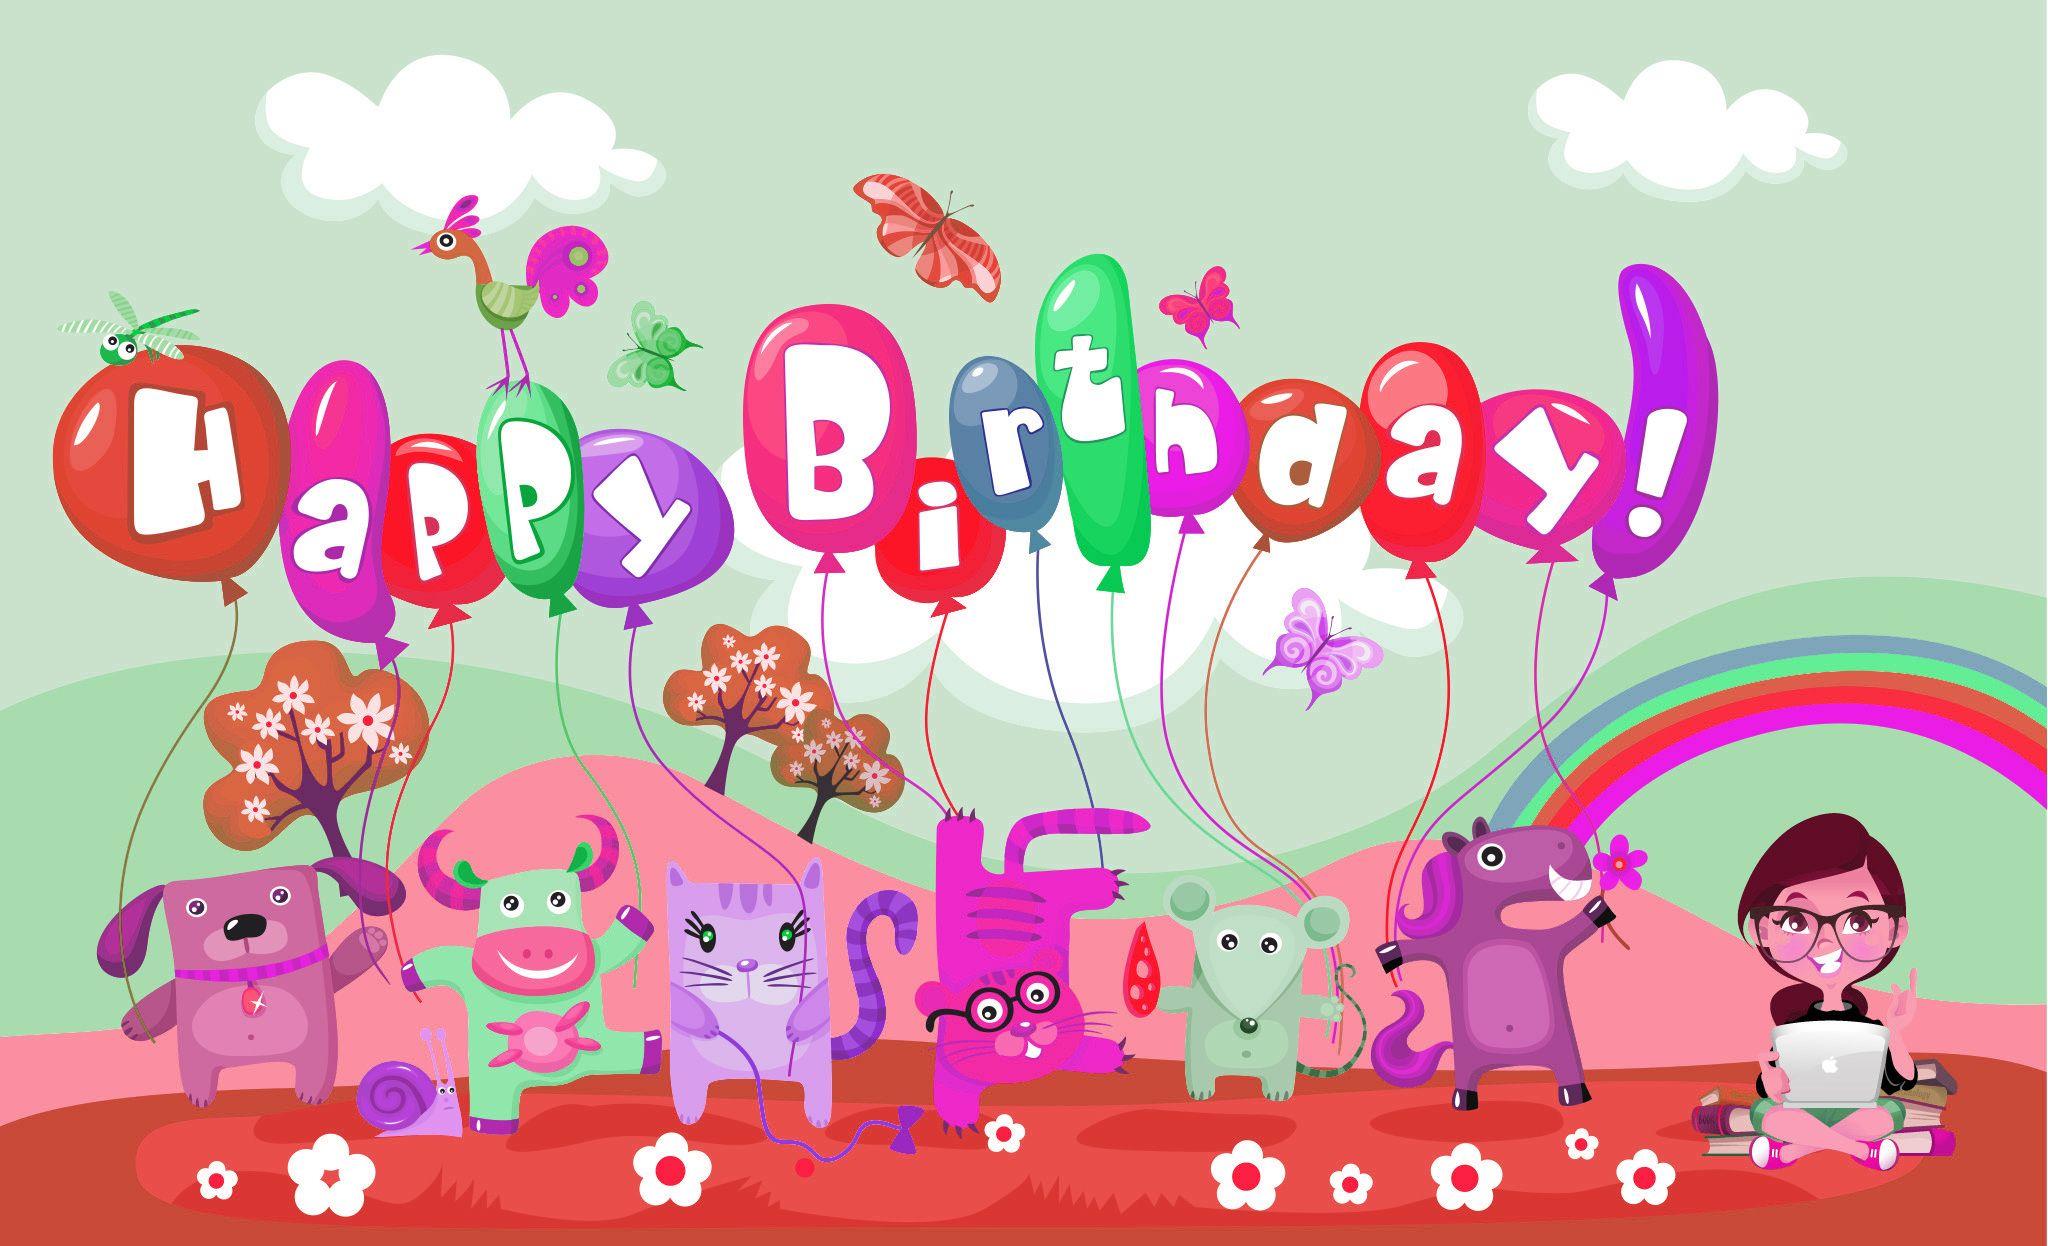 Funny Birthday Wallpaper Anime - Birthday Card Wallpaper Hd , HD Wallpaper & Backgrounds